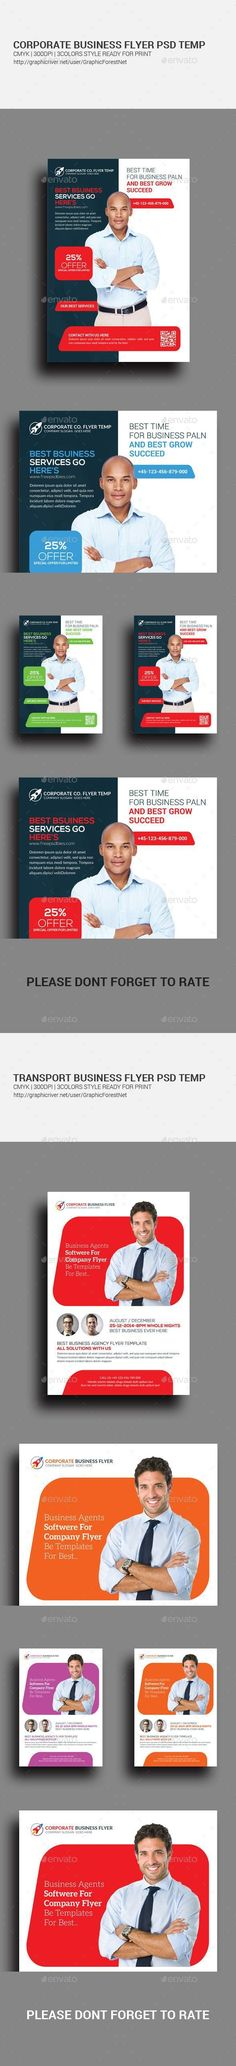 ◹ [GET]◥ Business Corporate Psd Flyers Bundle Business Business Flyer Corporate Corporate Flyer Creative Creative Flyer Buy Business, Modern Business Cards, Business Card Design, Business Flyers, Psd Flyer Templates, Business Flyer Templates, Print Templates, Corporate Flyer, Corporate Business